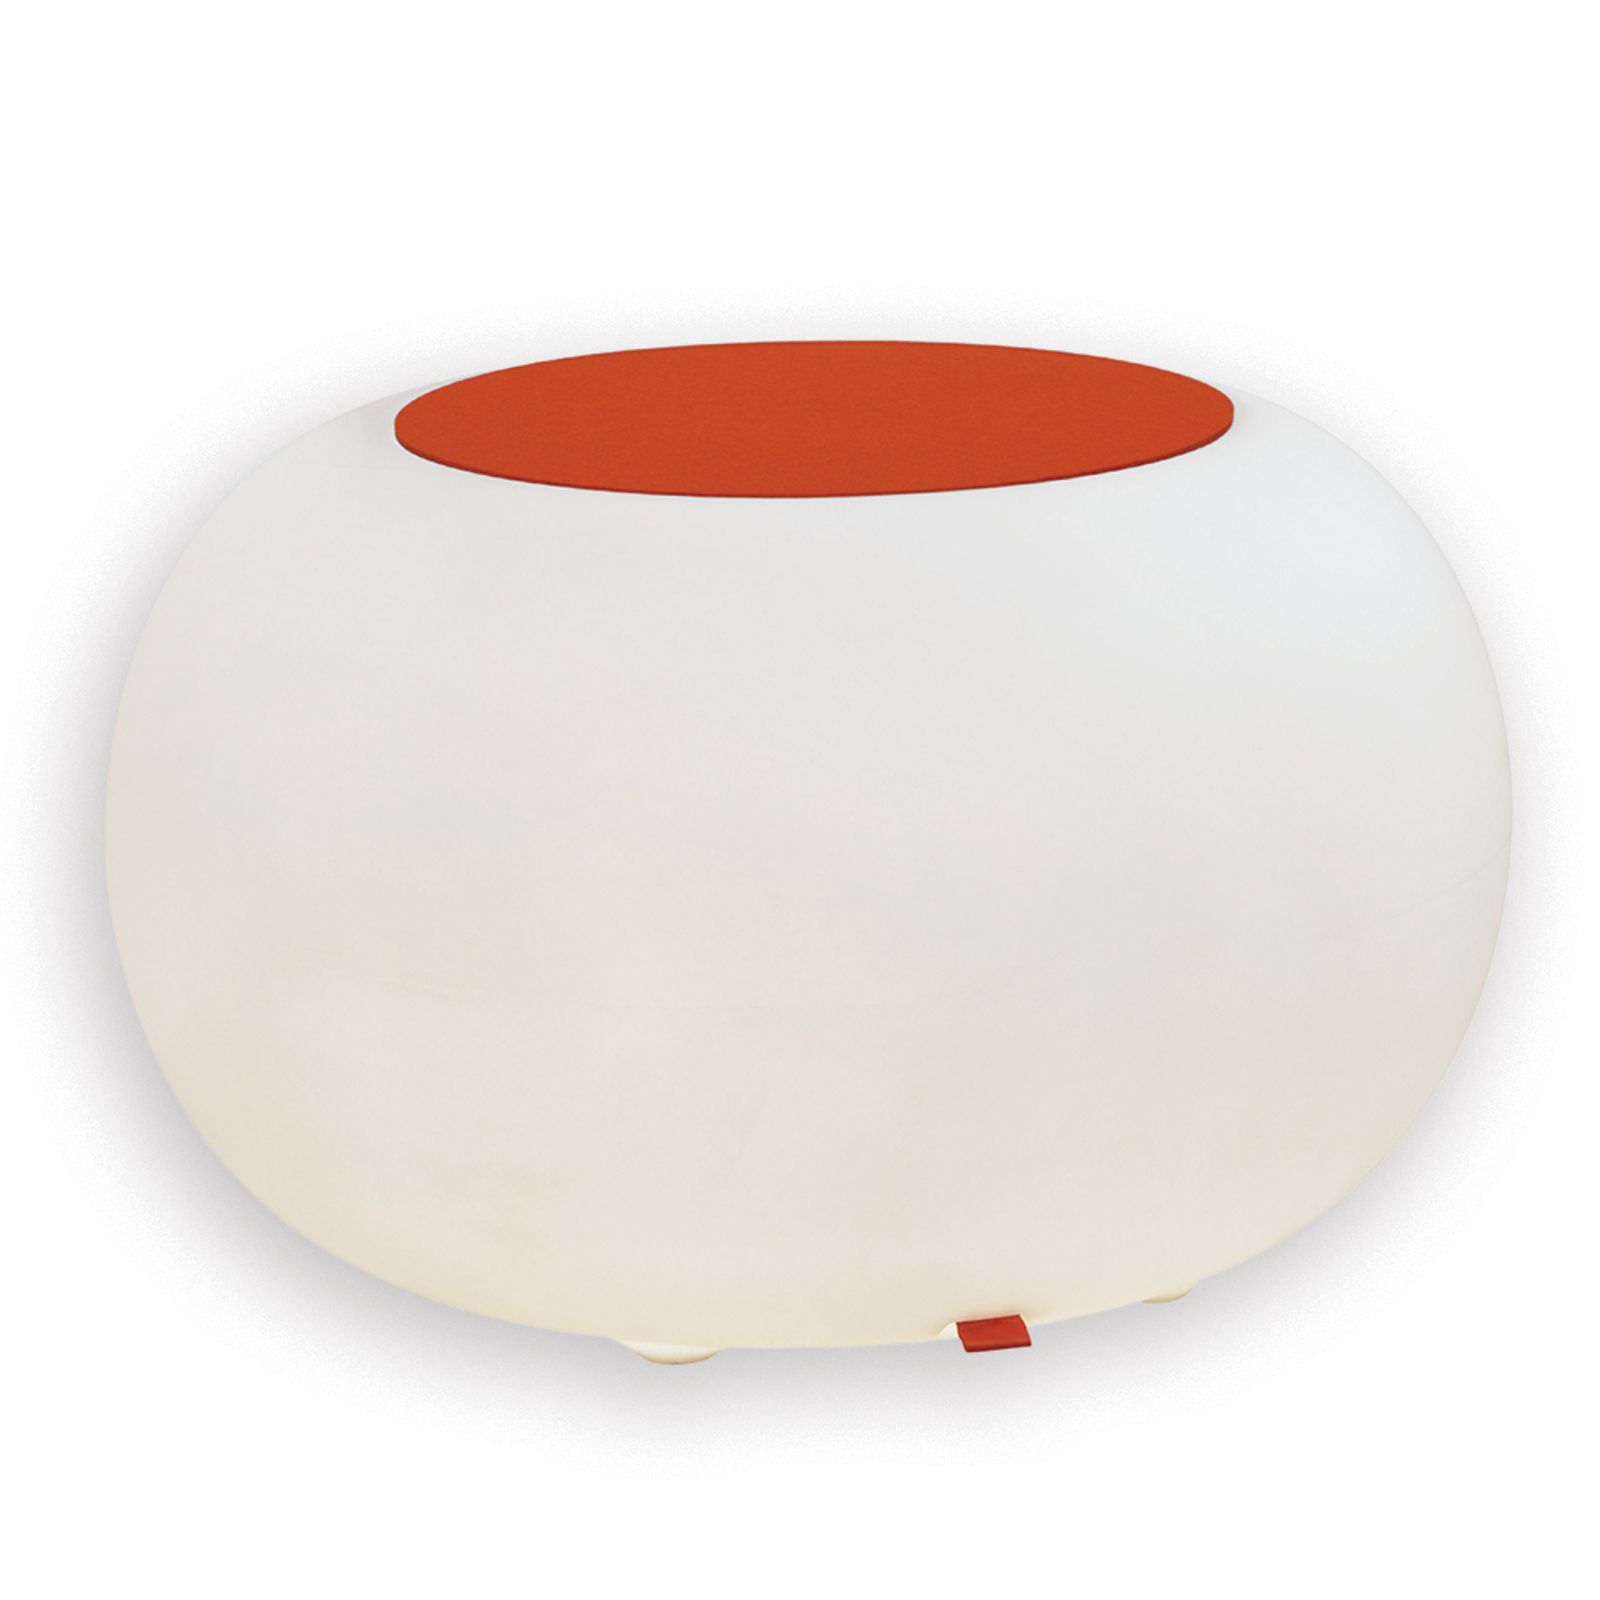 Bijzettafel BUBBLE, RGB-LED met oranje vilt